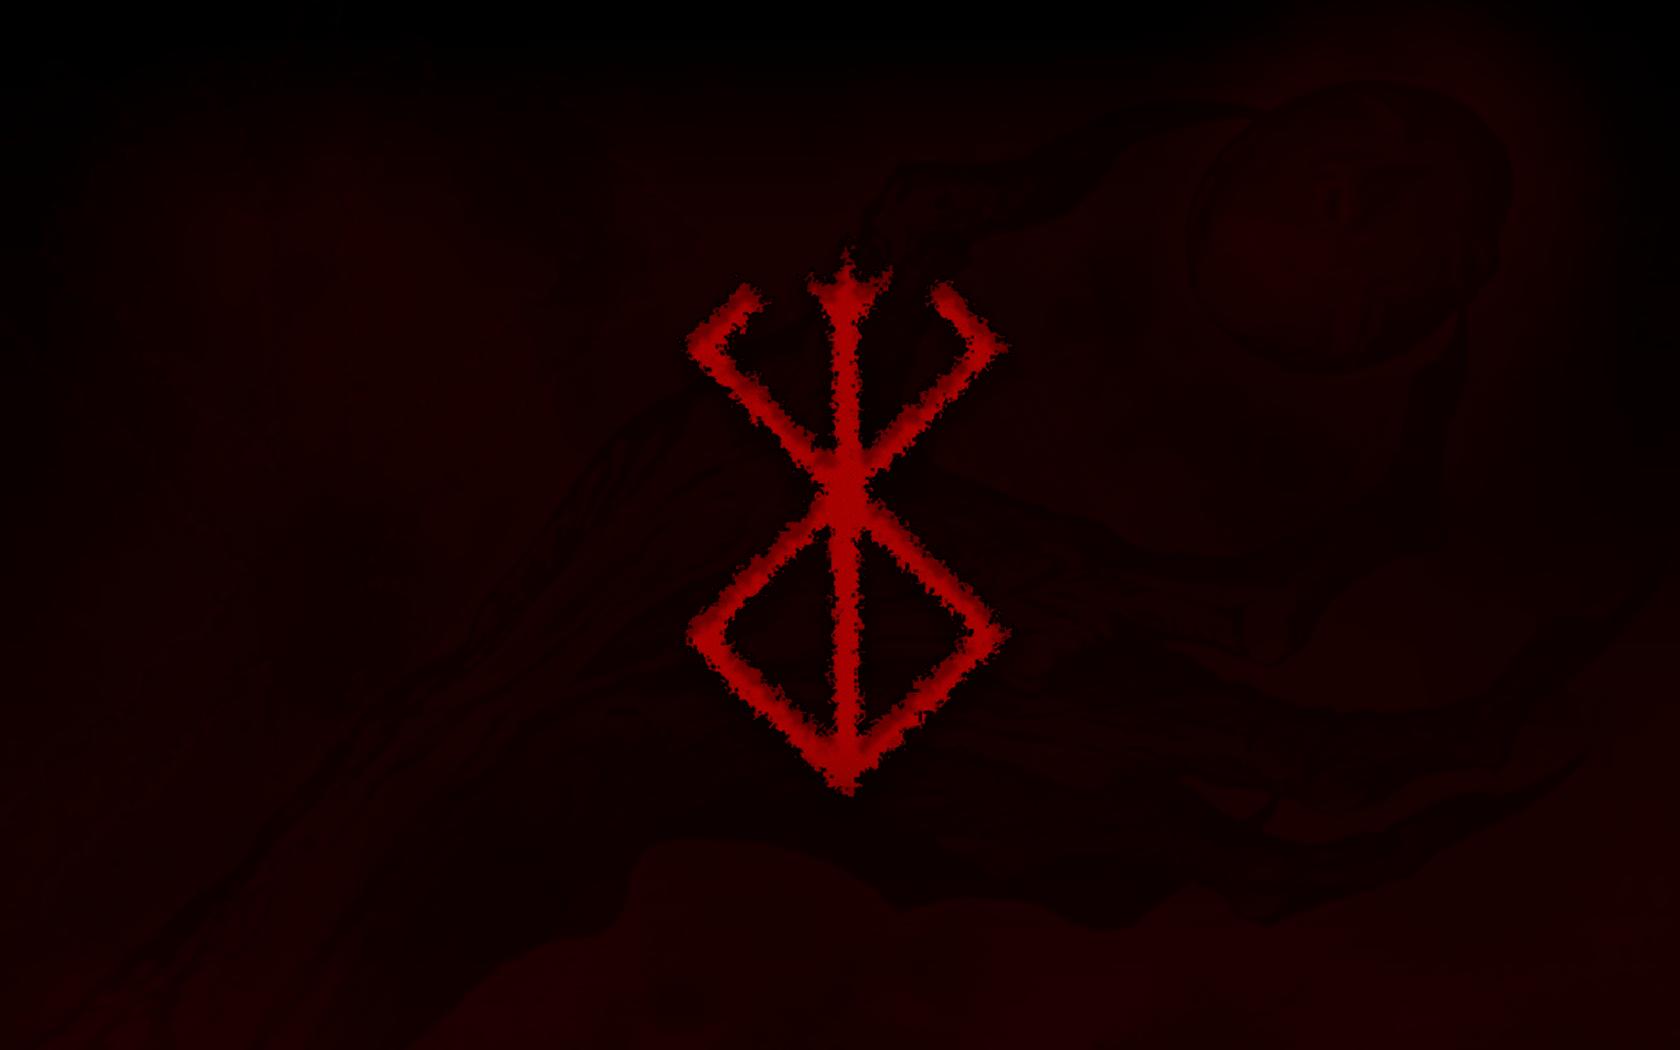 Berserk Mark Of Sacrifice